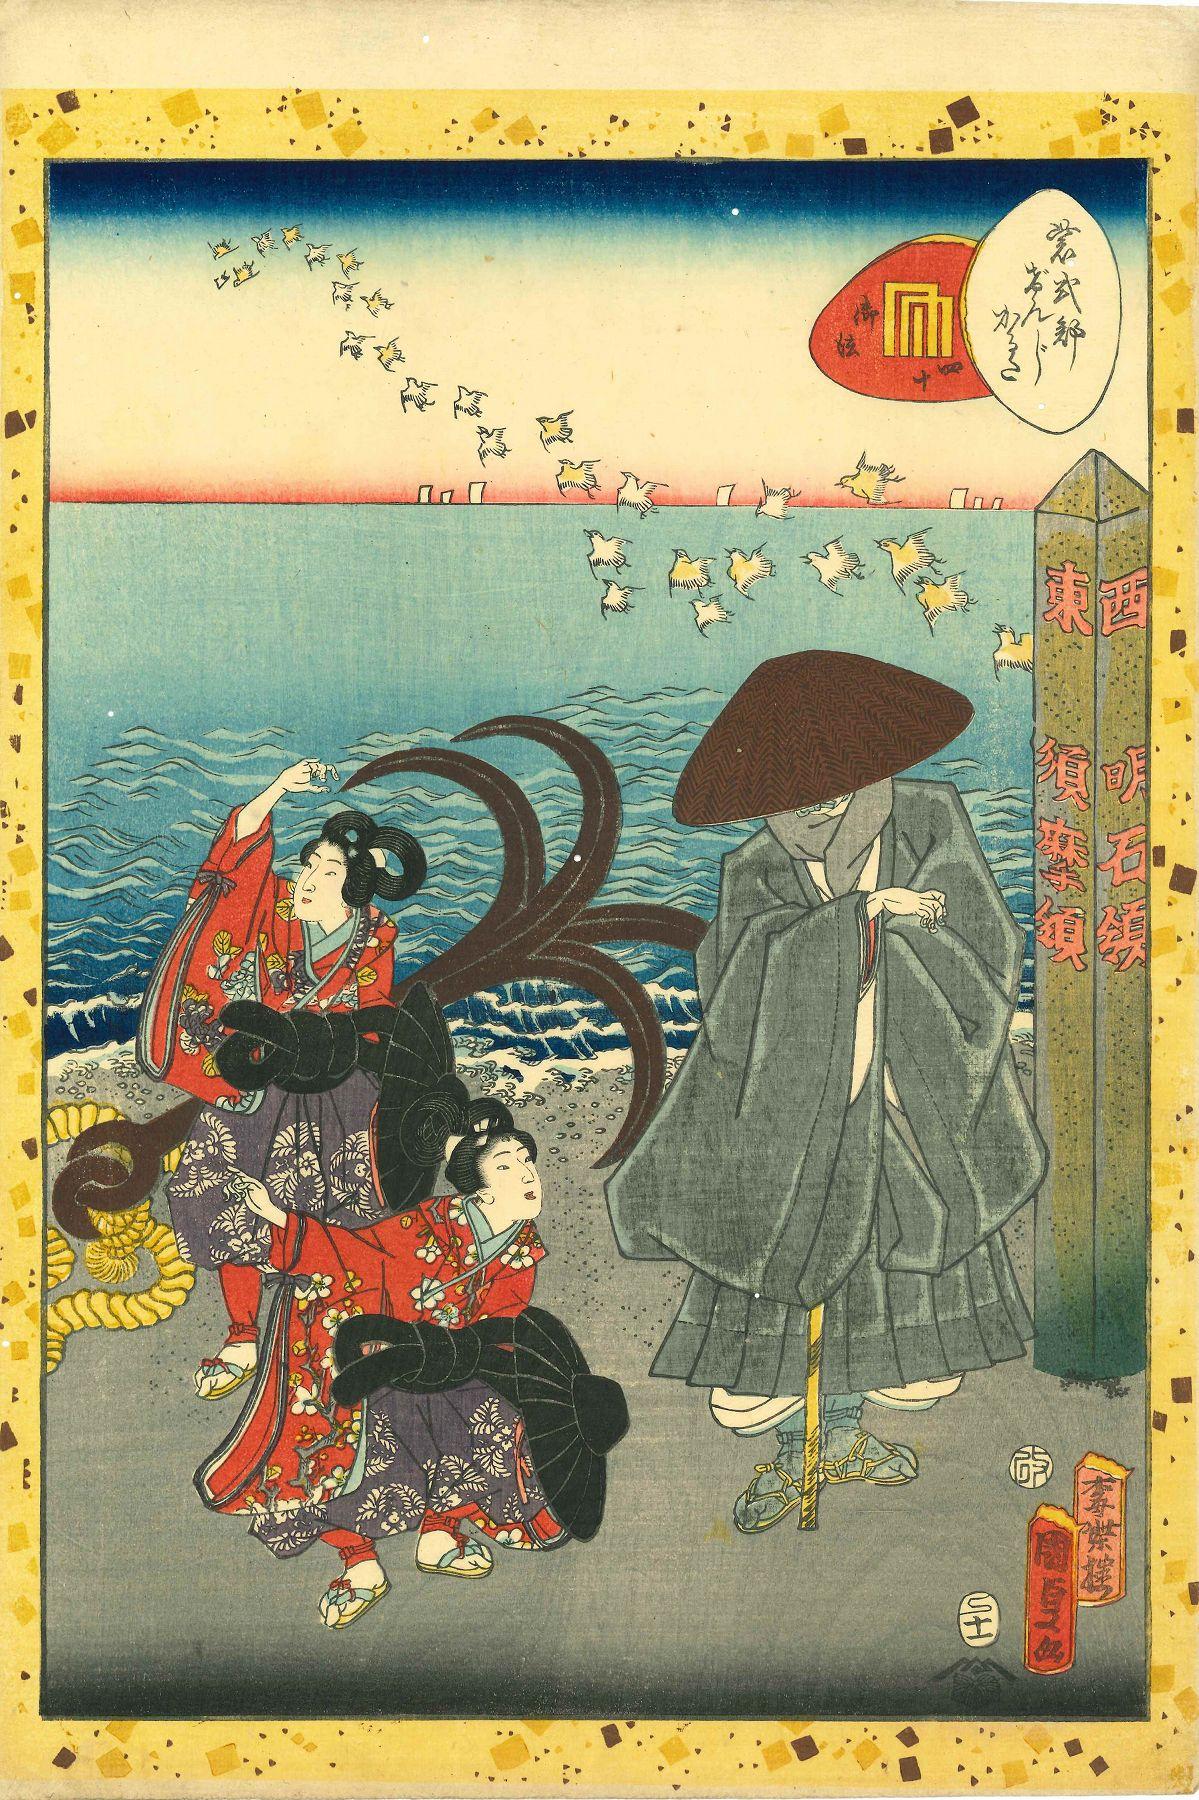 KUNISADA II <i>Minori</i>, Chapter 40, from <i>Murasaki Shikibu Genji karuta</i> (Card game of the tale of Genji by Lady Murasaki)